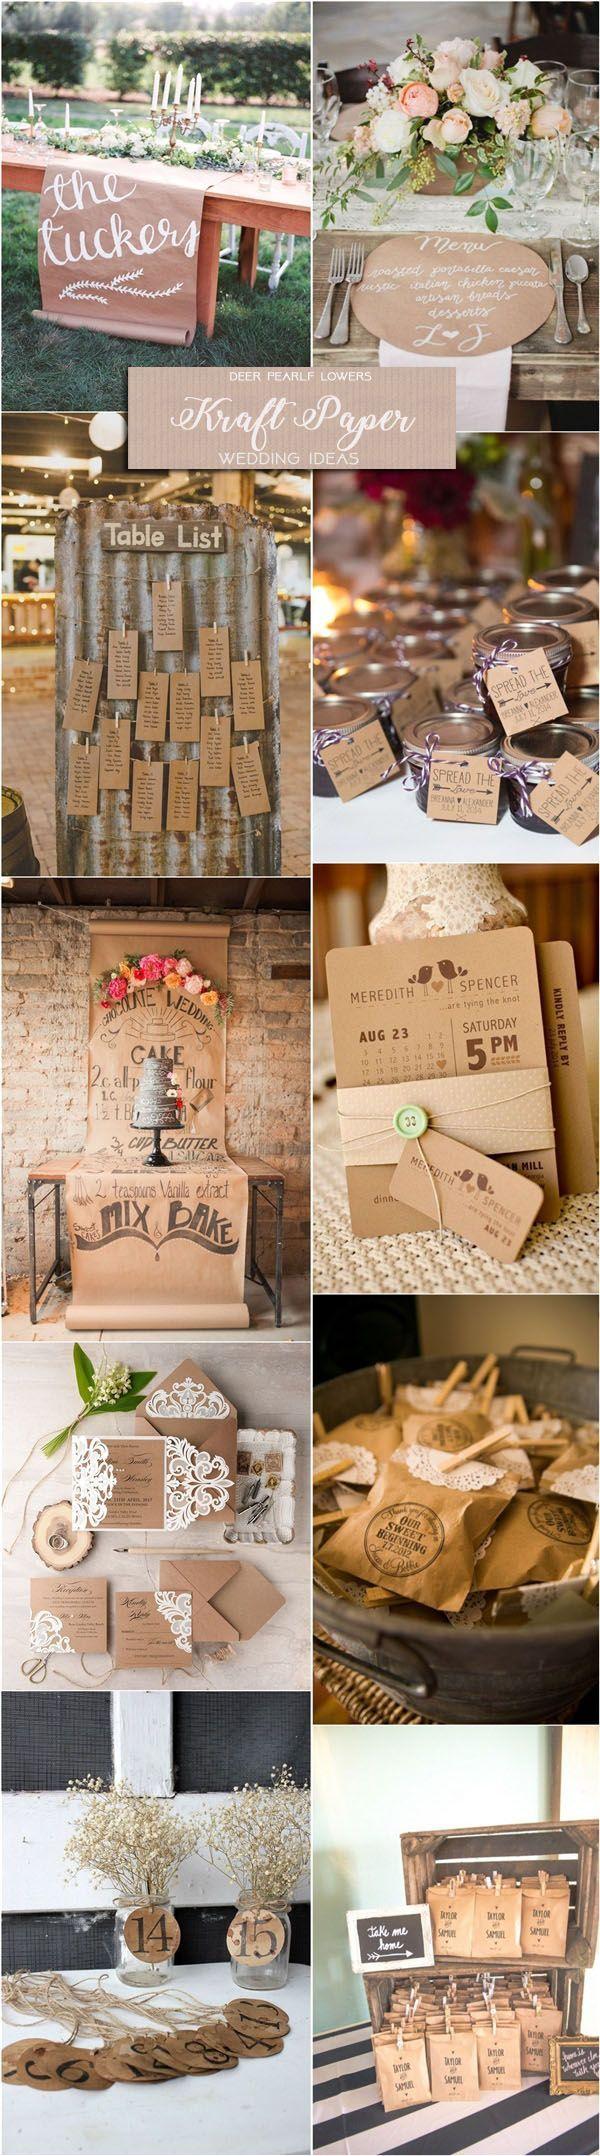 Rustic country wedding ideas - kraft paper wedding invitations & decor ideas / http://www.deerpearlflowers.com/rustic-wedding-themes-ideas/2/